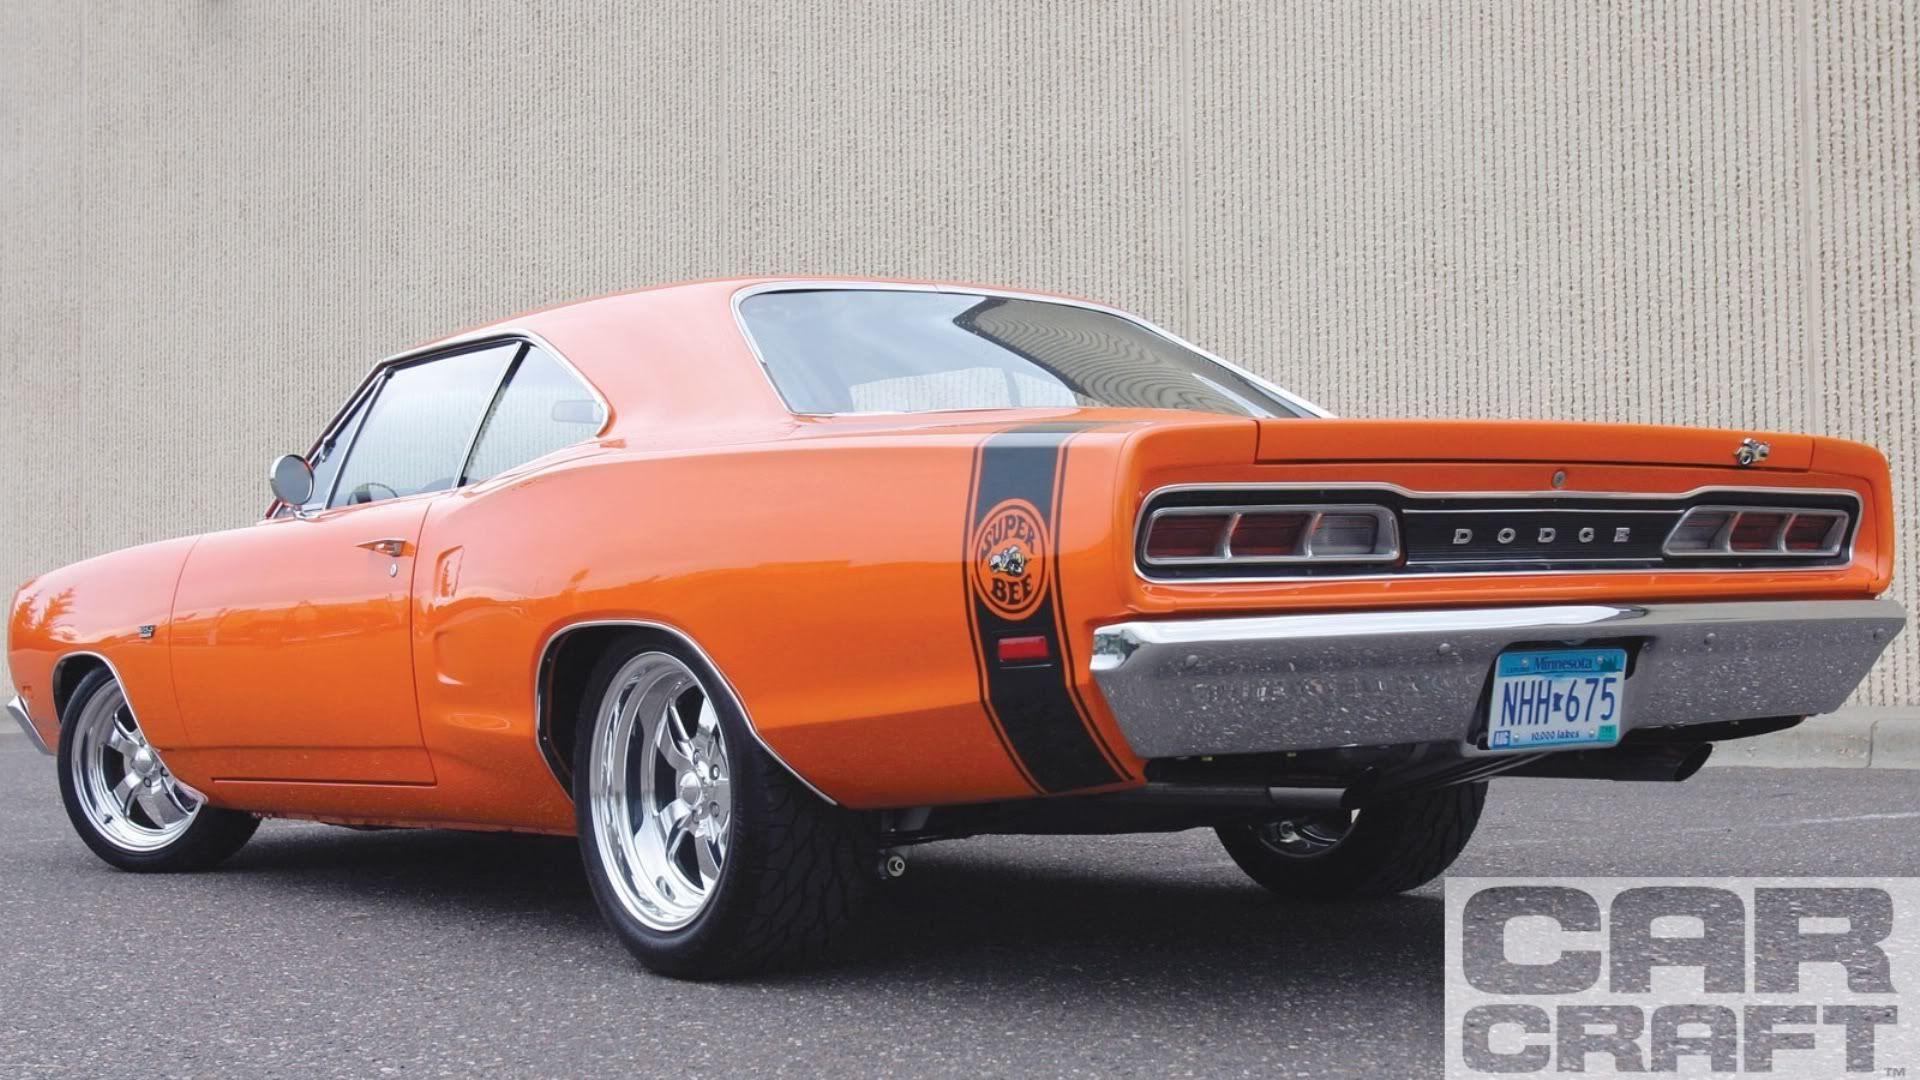 1969orangedodgesuperbee Jpg 1920 1080 Dodge Super Bee Dodge Muscle Cars Classic Cars Muscle